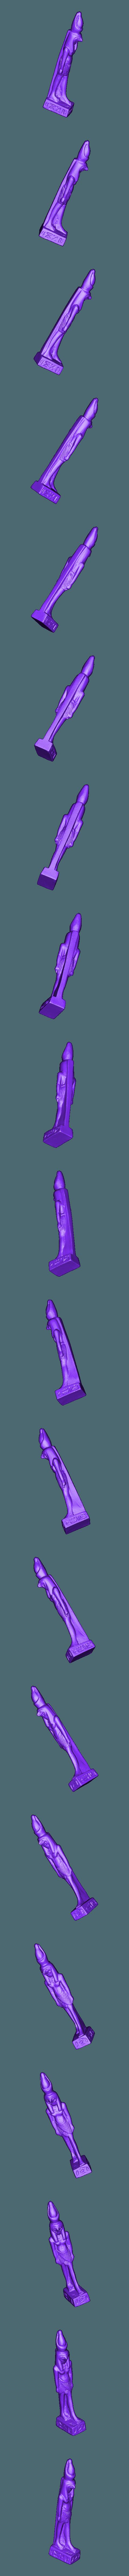 stl_a58167b1053bf3f4addb33a009384b27_2202.stl Download free STL file Ancient Egyptian Figurine of God Horus • 3D printable design, MarcoDaCunia55